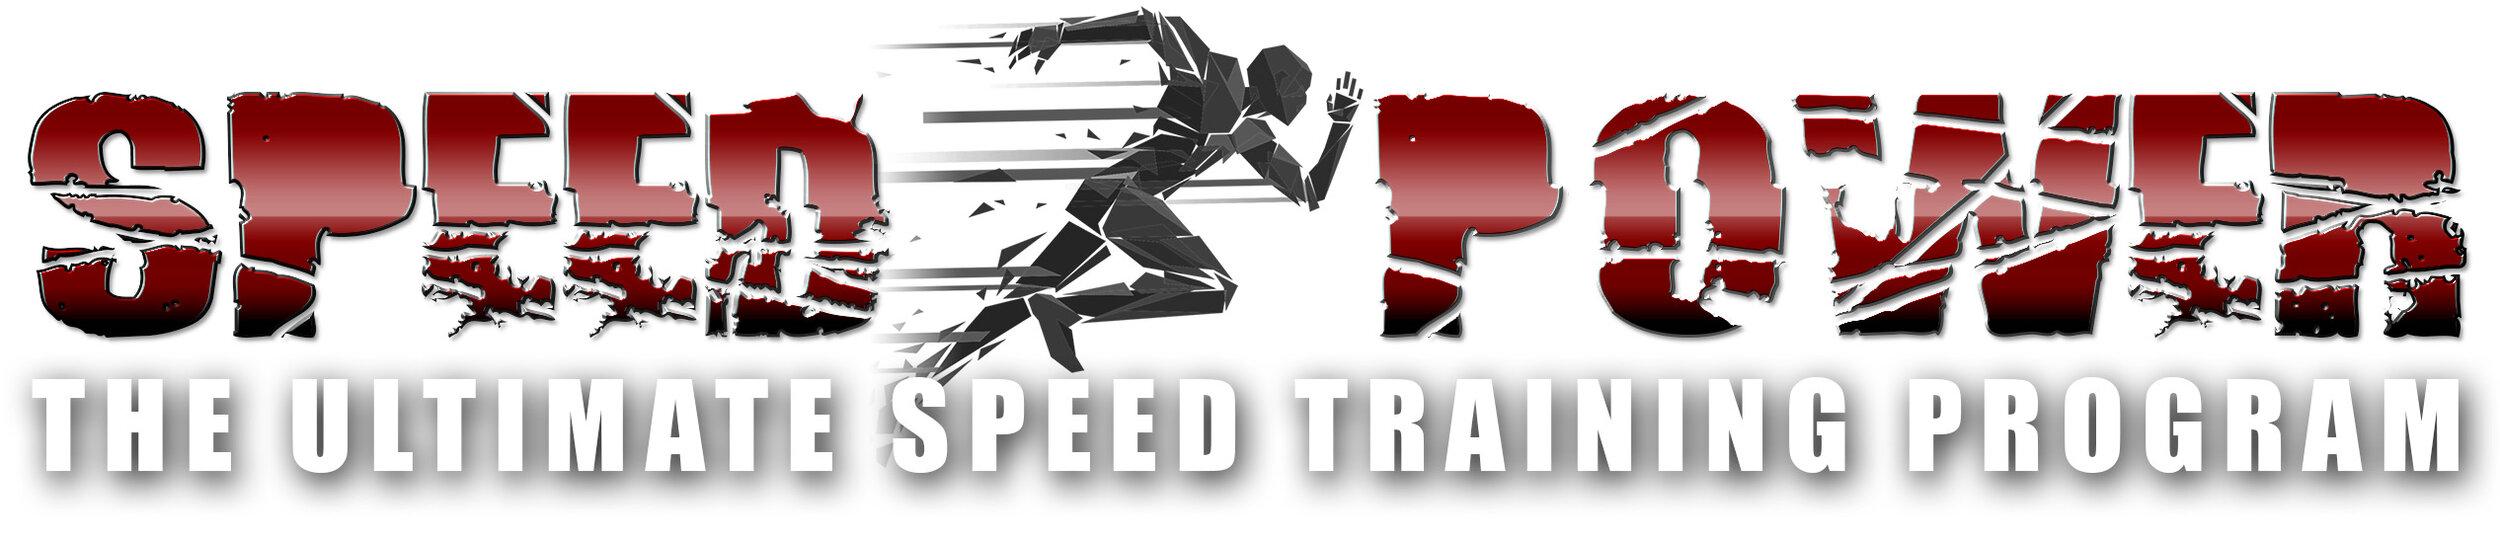 Speed Power Blitz Program Title (AHP).jpg